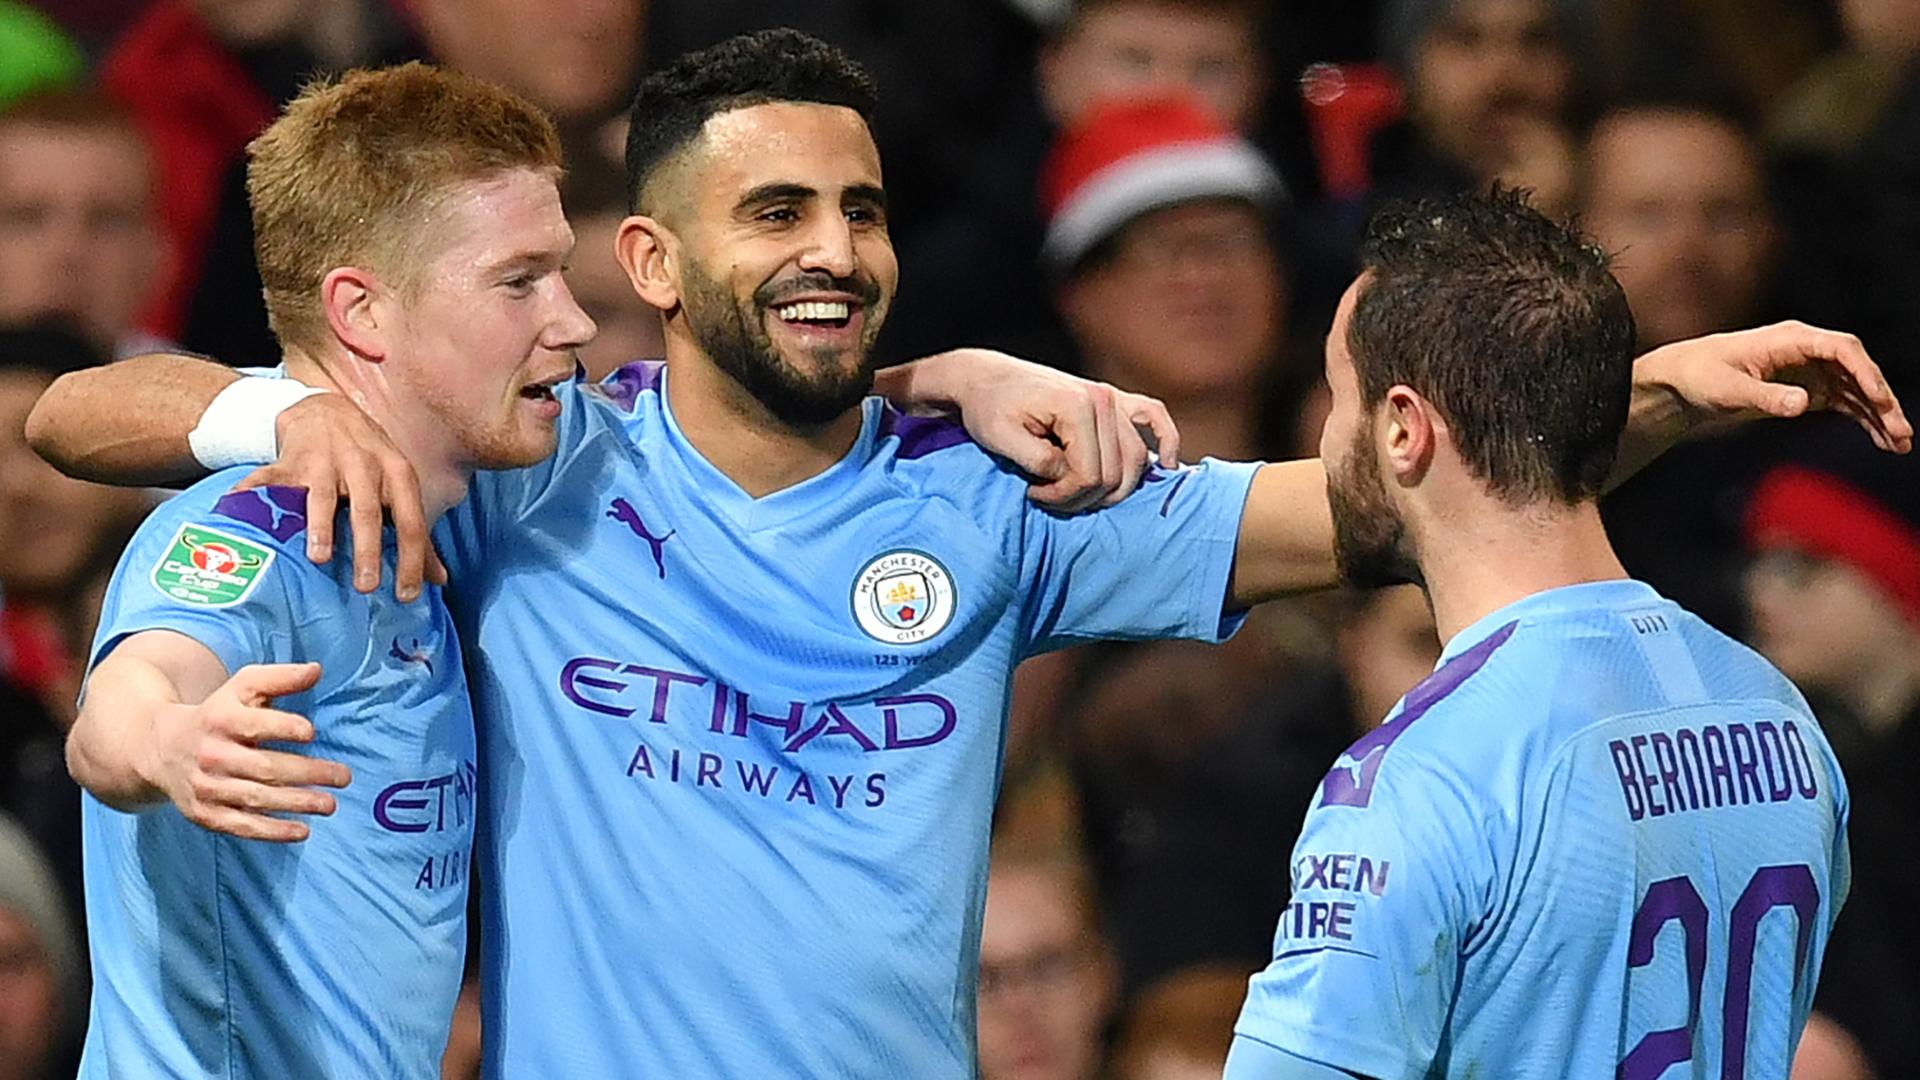 Can Mahrez lead Man City attack like Mane and Salah at Liverpool?